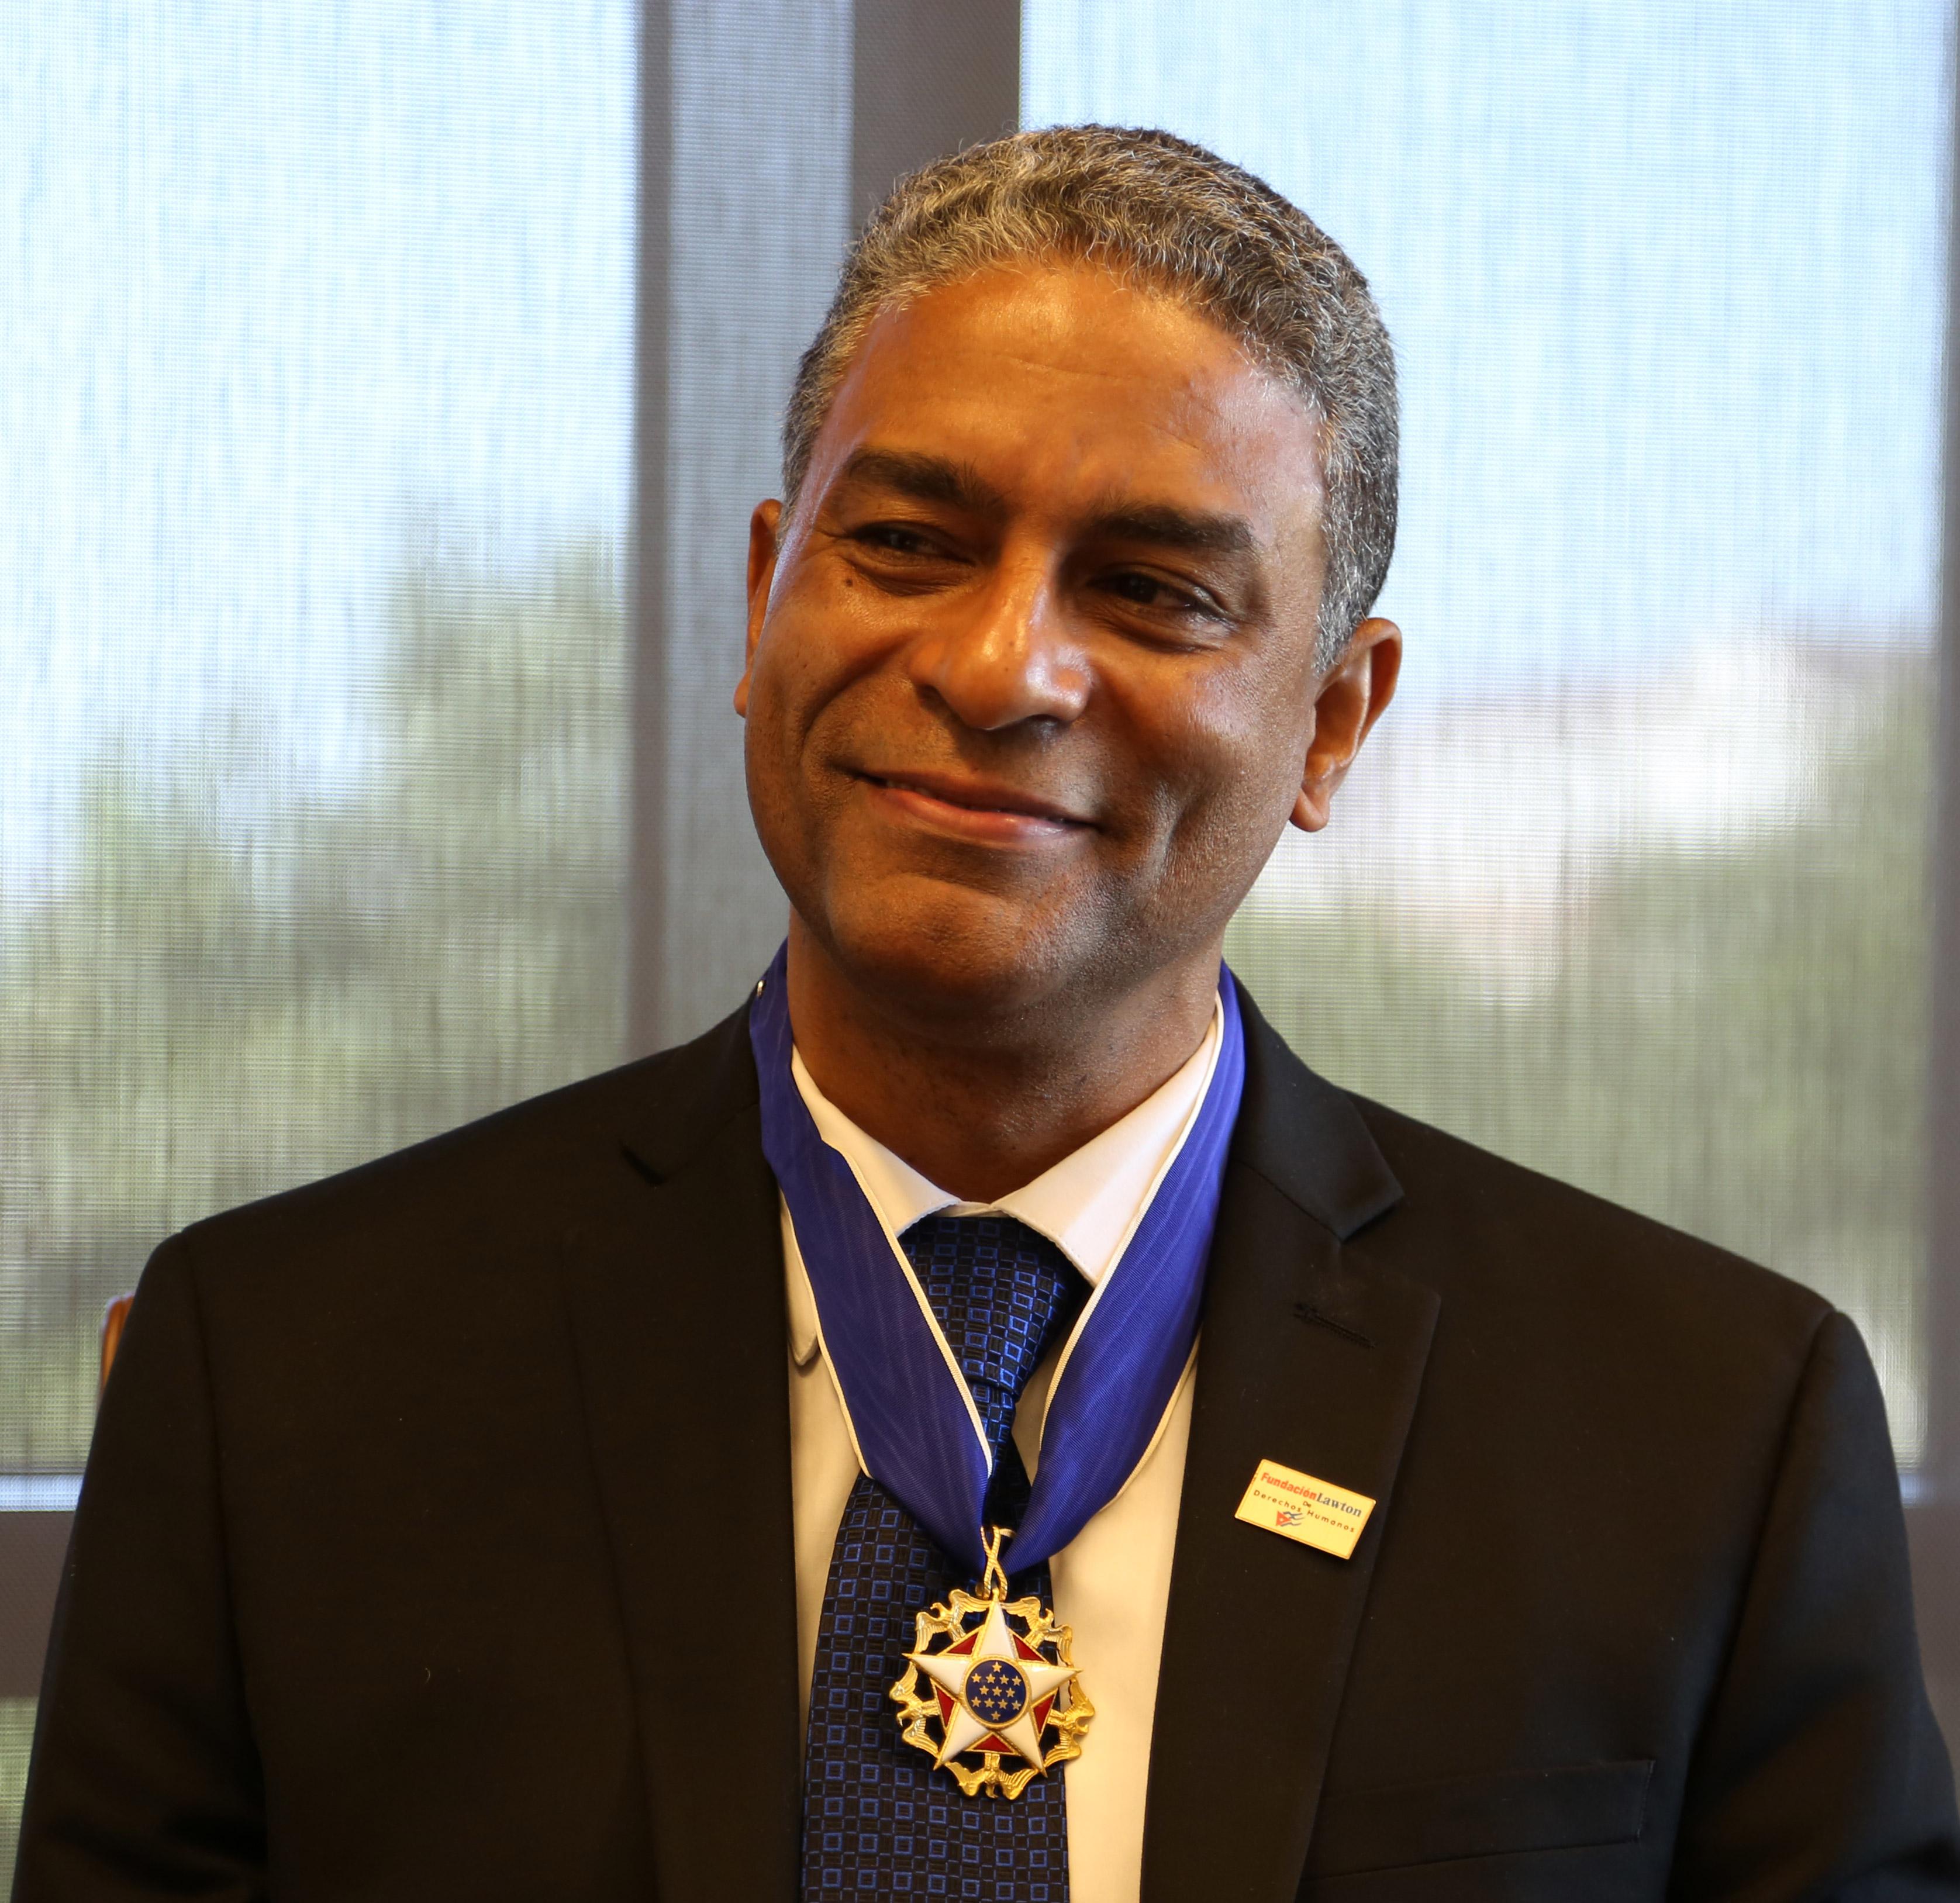 Dr. Oscar Elias Biscet